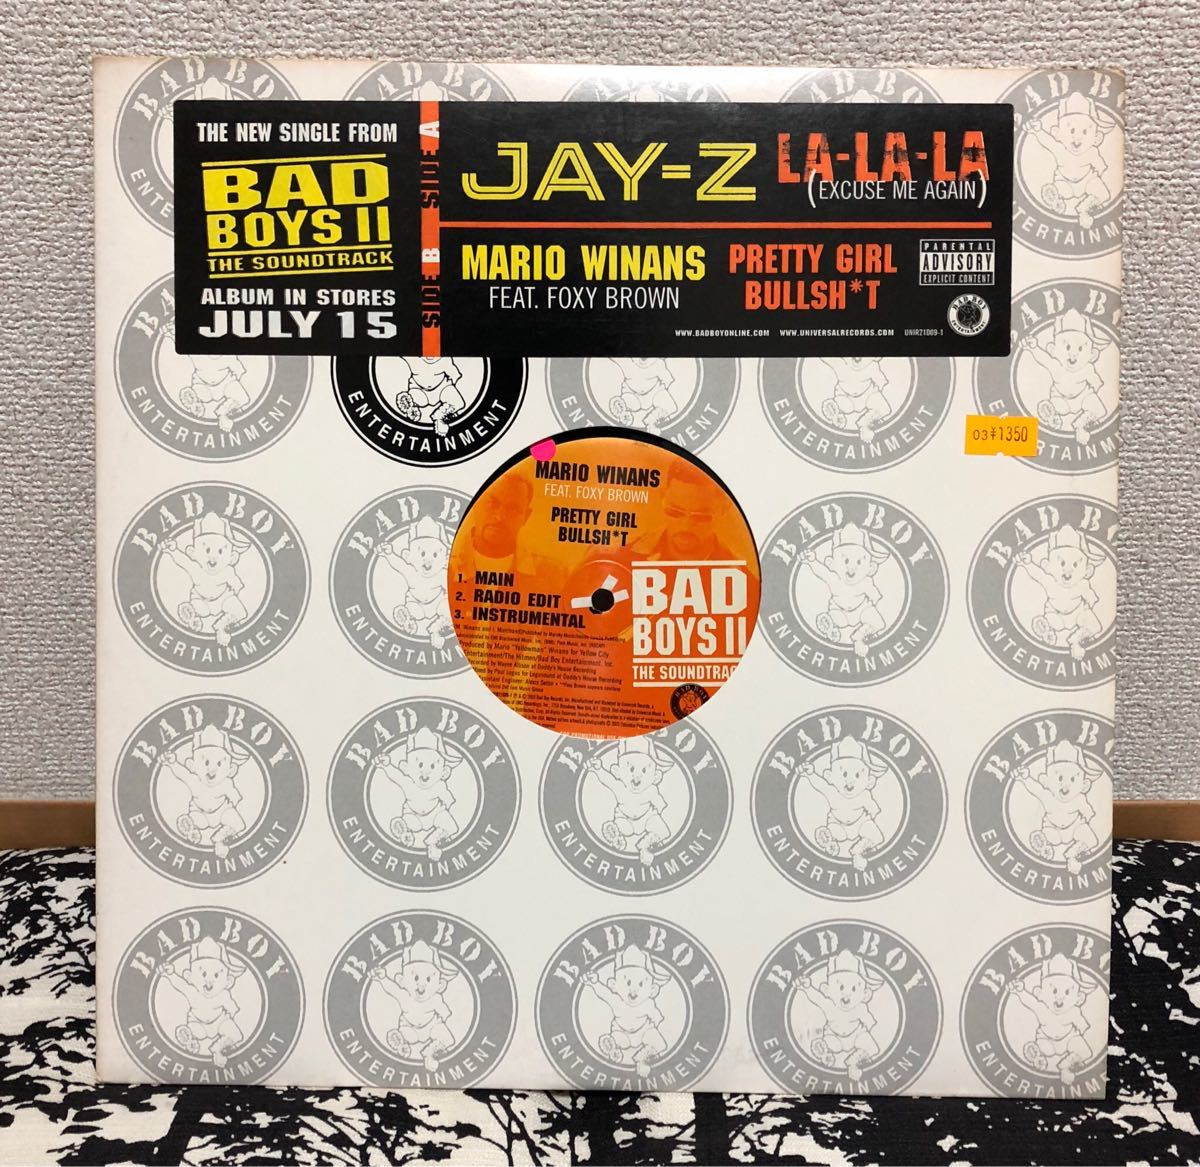 Bad Boys II Jay-Z Lalala バッドボーイズ ジェイジー 12inch レコード 激レア 廃盤 ヒップホップ アルバム クラブ ダンス_画像1